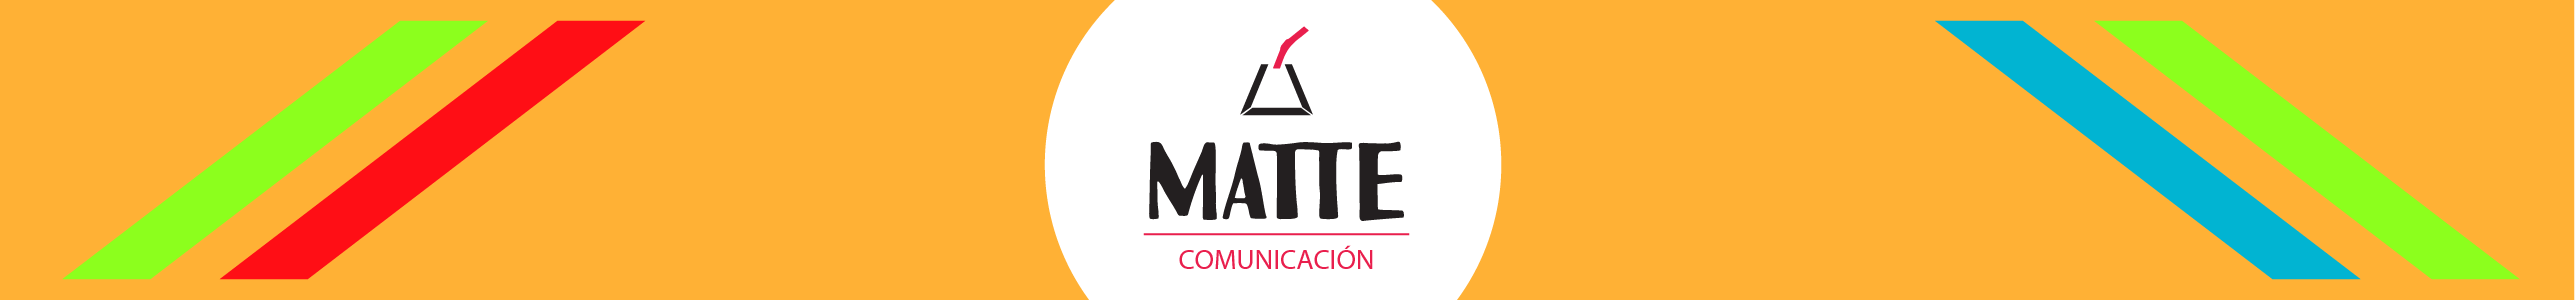 banner-matte1